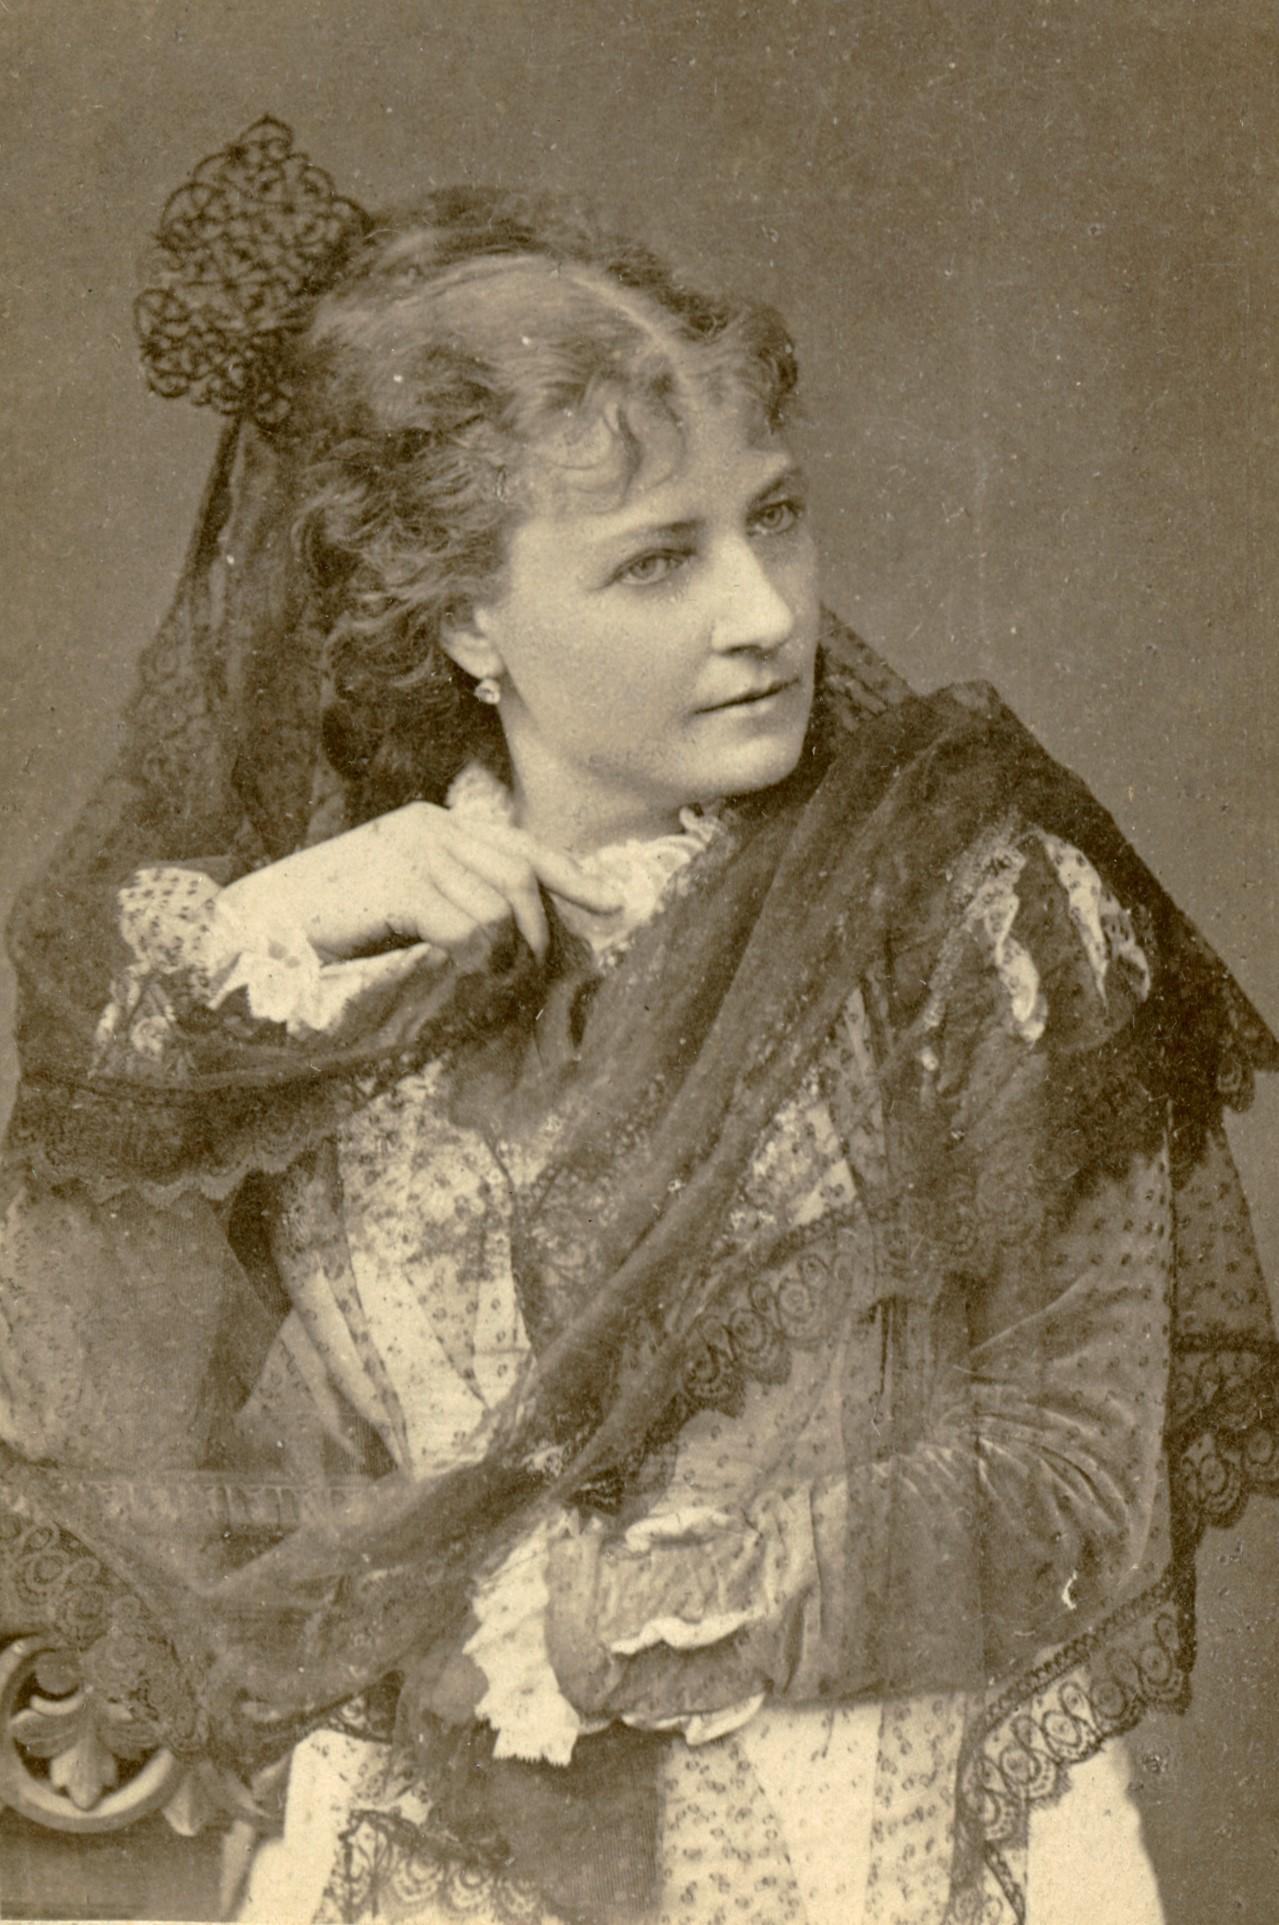 Elise Hwasser as Dolores in the Royal Teatre production of Allt för fosterlandet, 1878. Photo: Selma Jacobsson (1841-1899). Musik- och teaterbiblioteket, Stockholm, H4_145